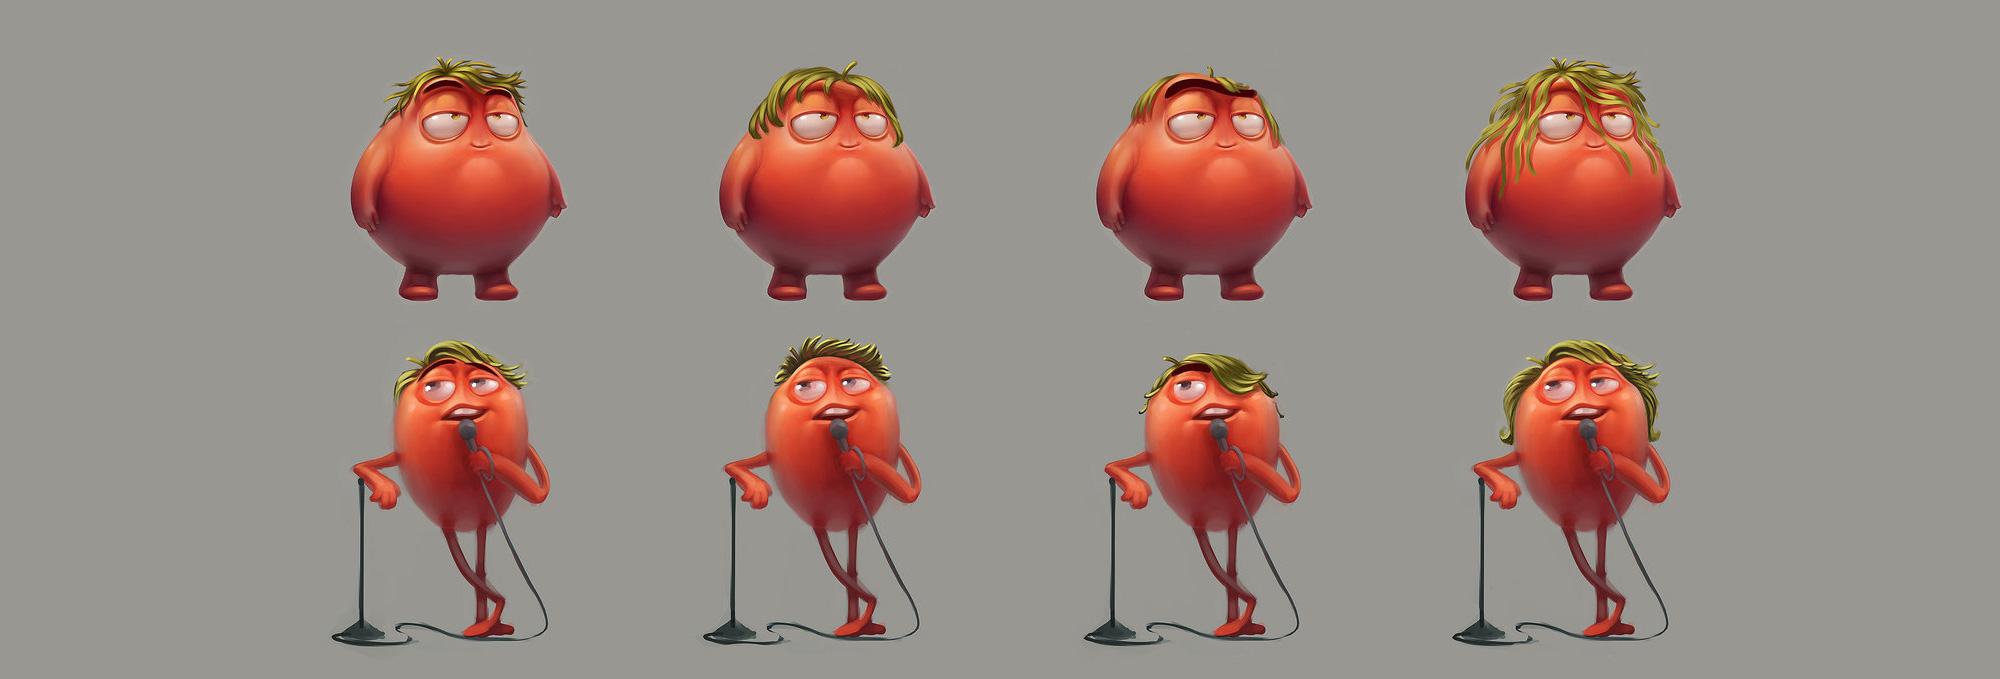 personagem-tomate-fruta-animacao-experiencia-marca-hellmanns-01